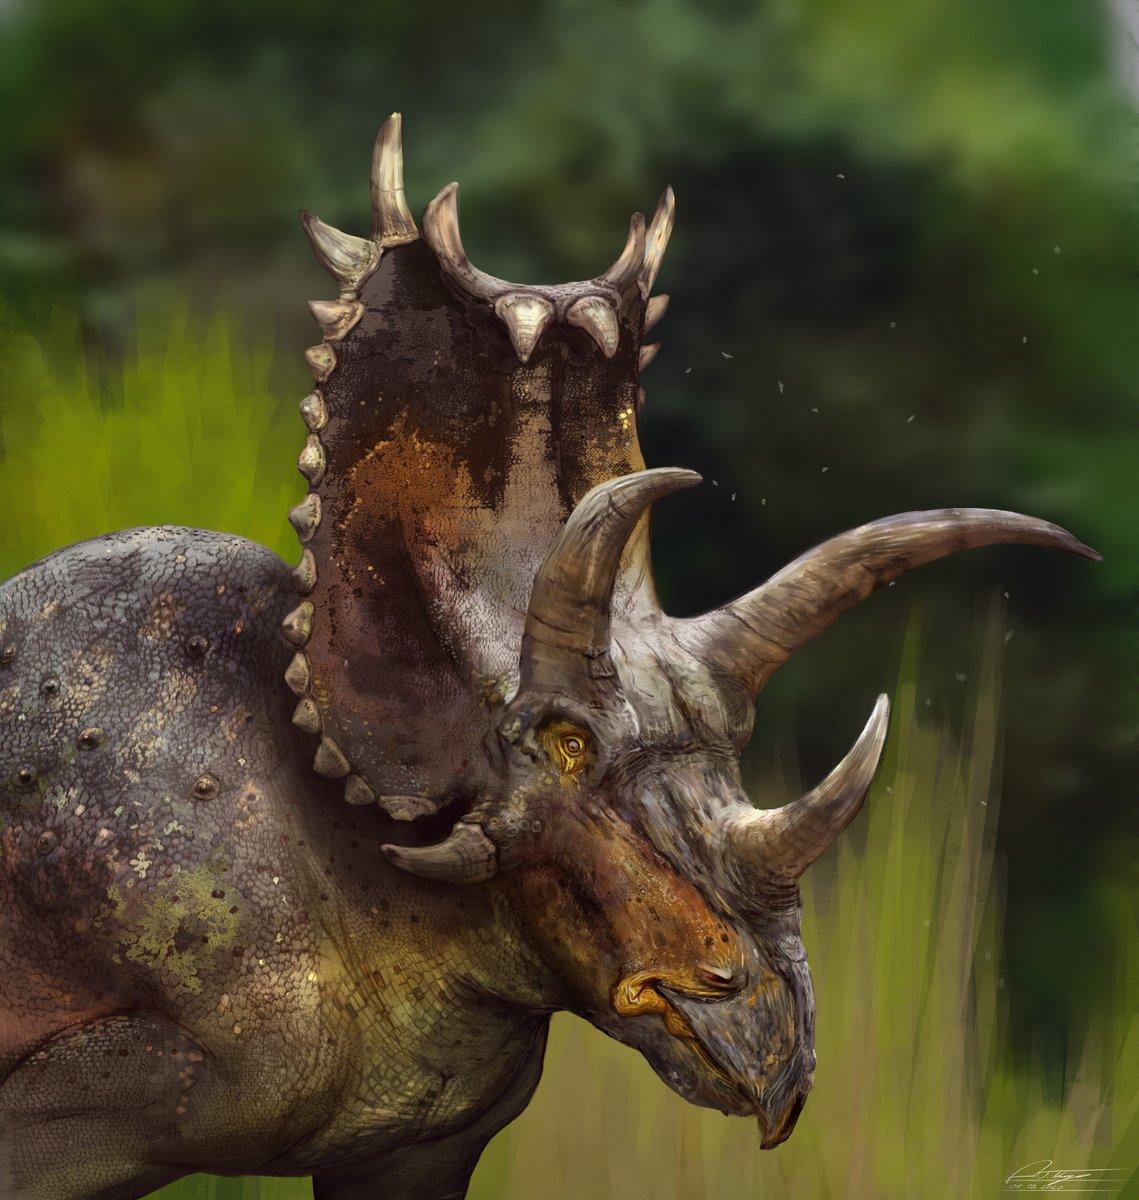 Some #Ceratopsian #illustrations created over the past few weeks: Pentaceratops, Einiosaurus and Styracosaurus! #paleoart #NaturalHistory #prehistoric #scientificillustration #dinosaurs #nature #wildlife #digitalart #animalart #naturelovers #reptilespic.twitter.com/EBO1AEVzp7